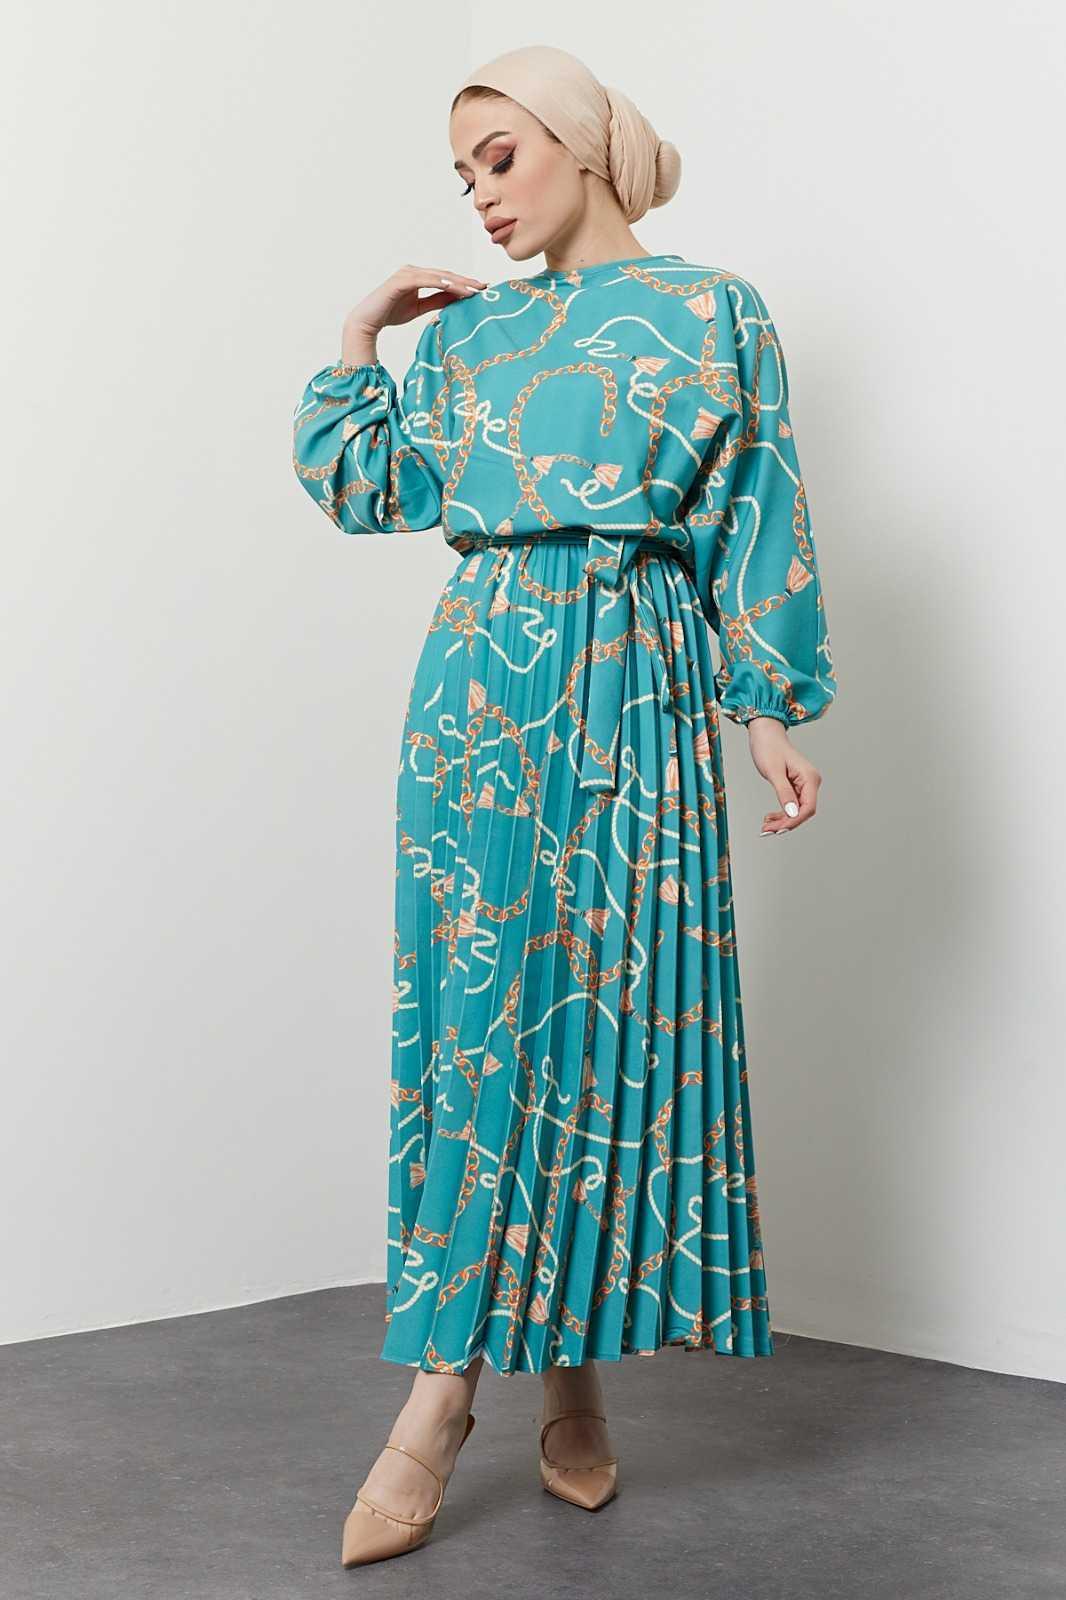 İkra Tesettür Krep Elbise Modelleri